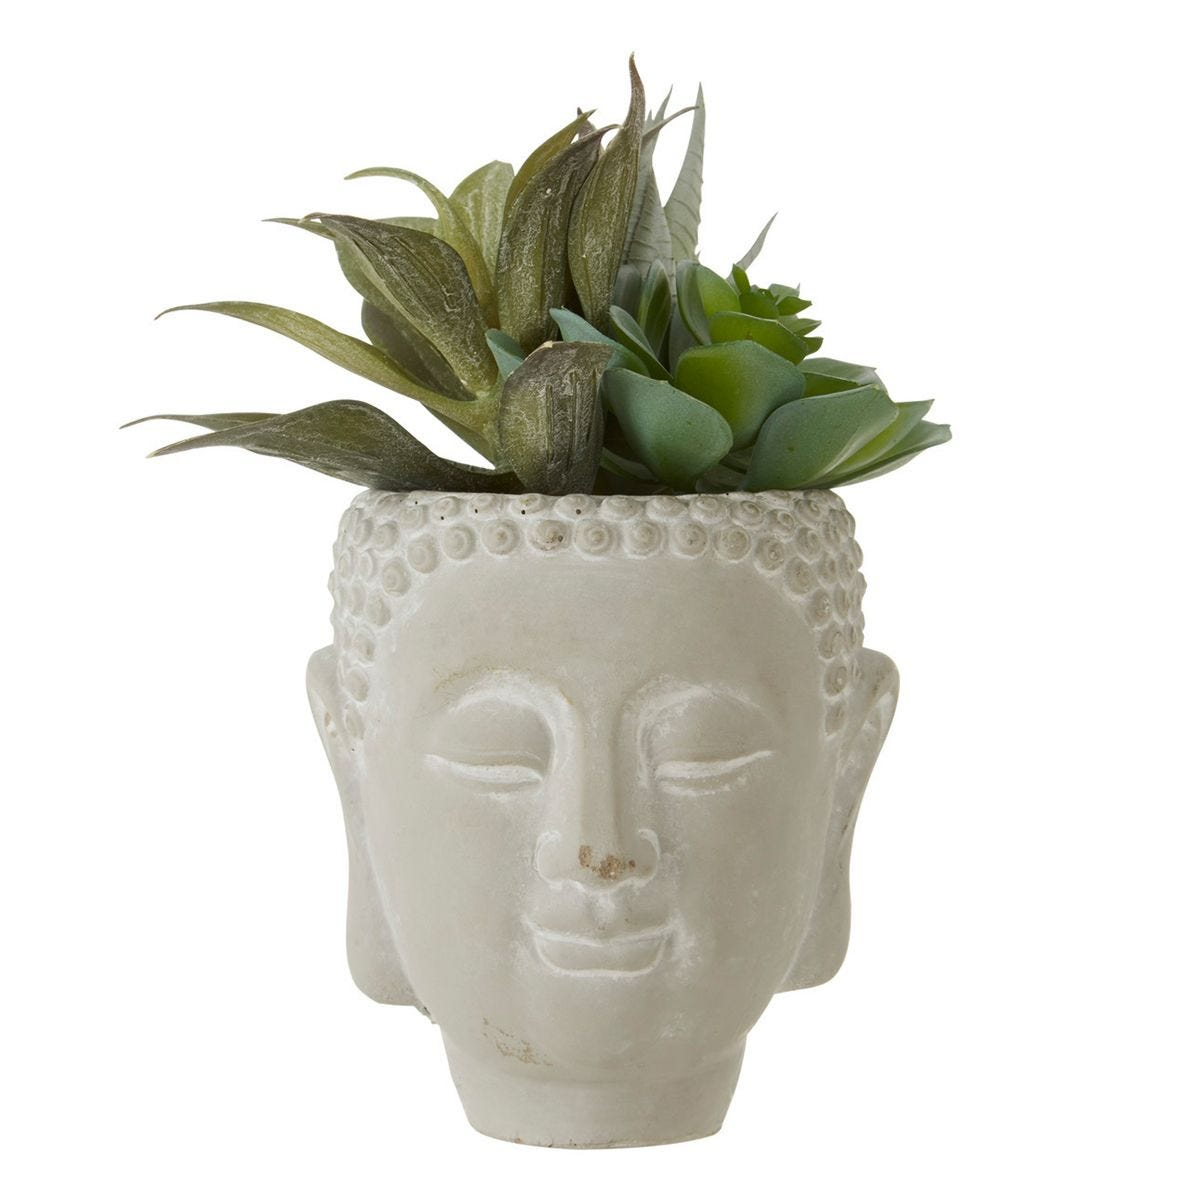 Mixed Succulent Buddha Pot - White Wash Cement